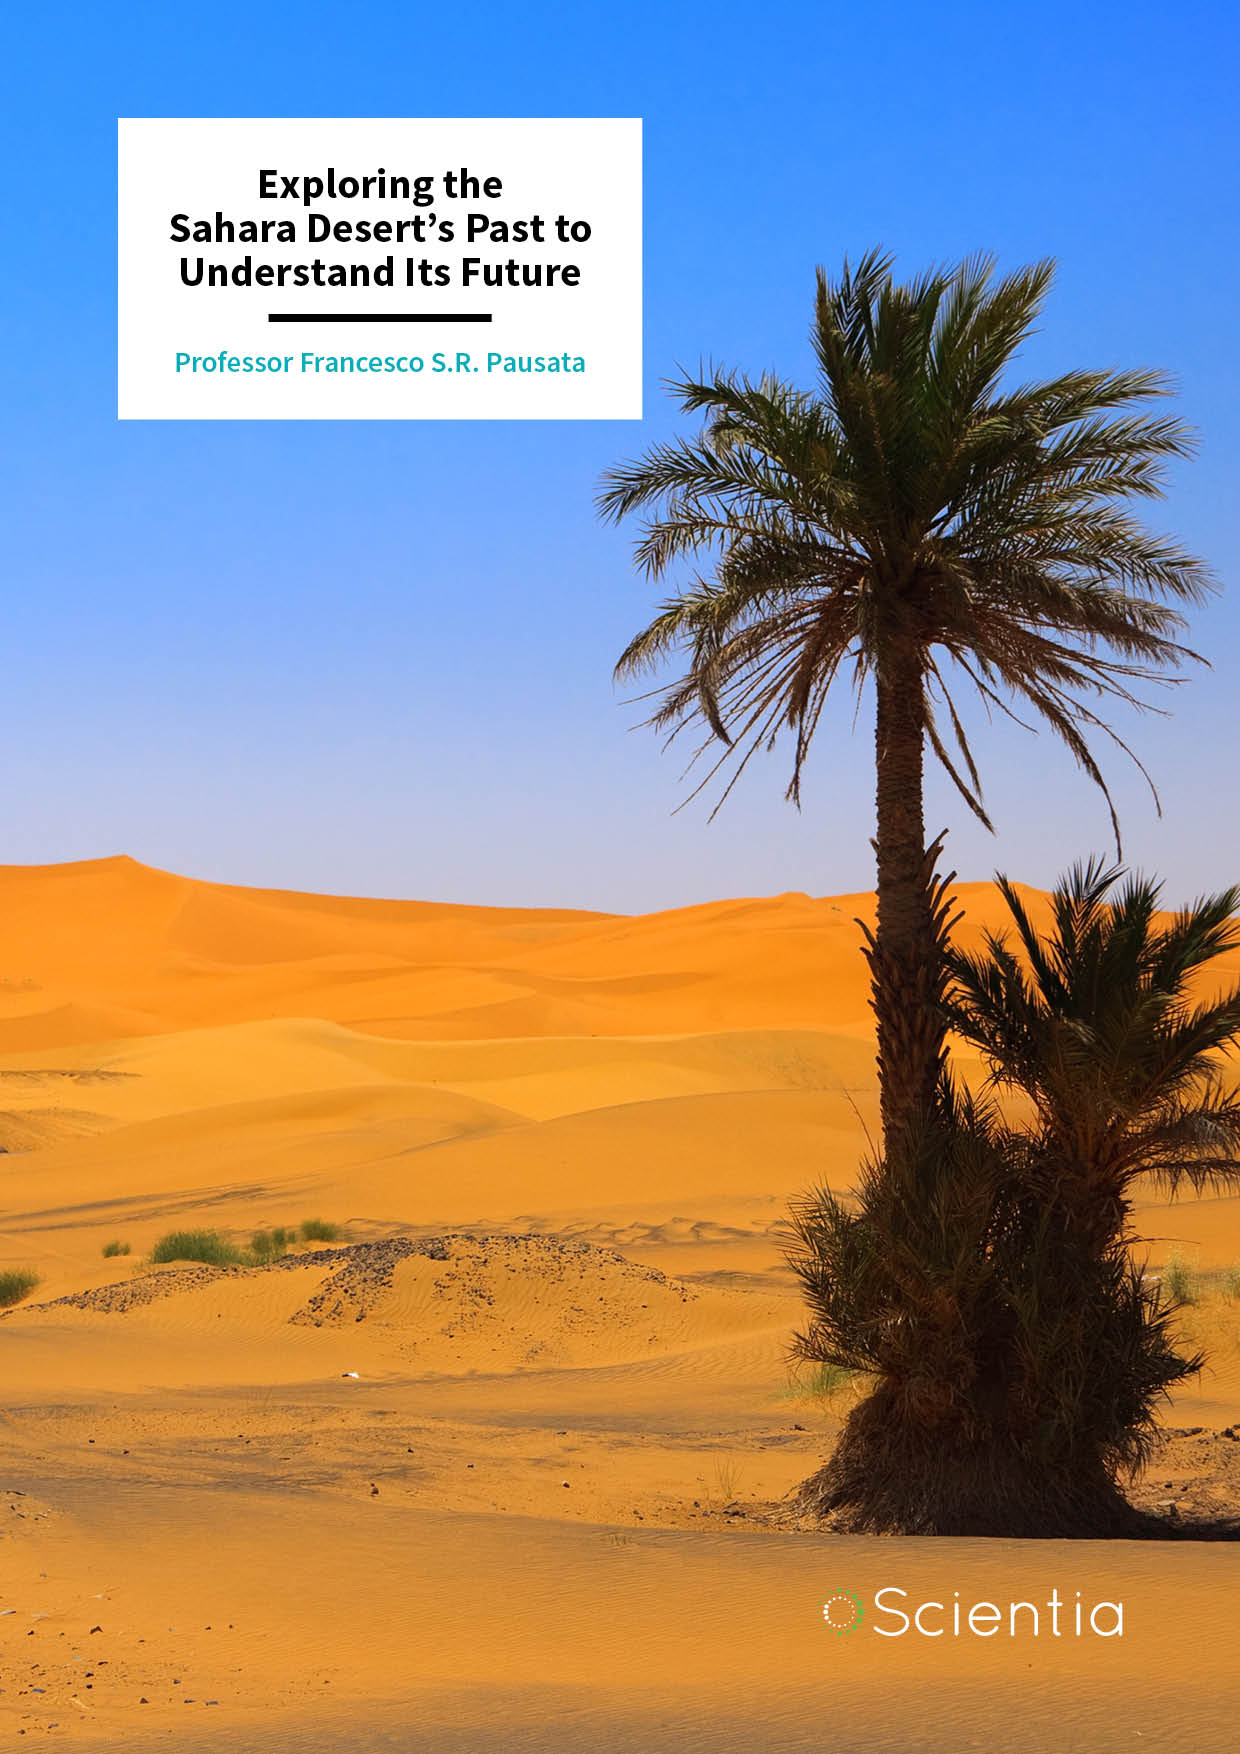 Dr Francesco Pausata – Exploring the Sahara Desert's Past to Understand Its Future